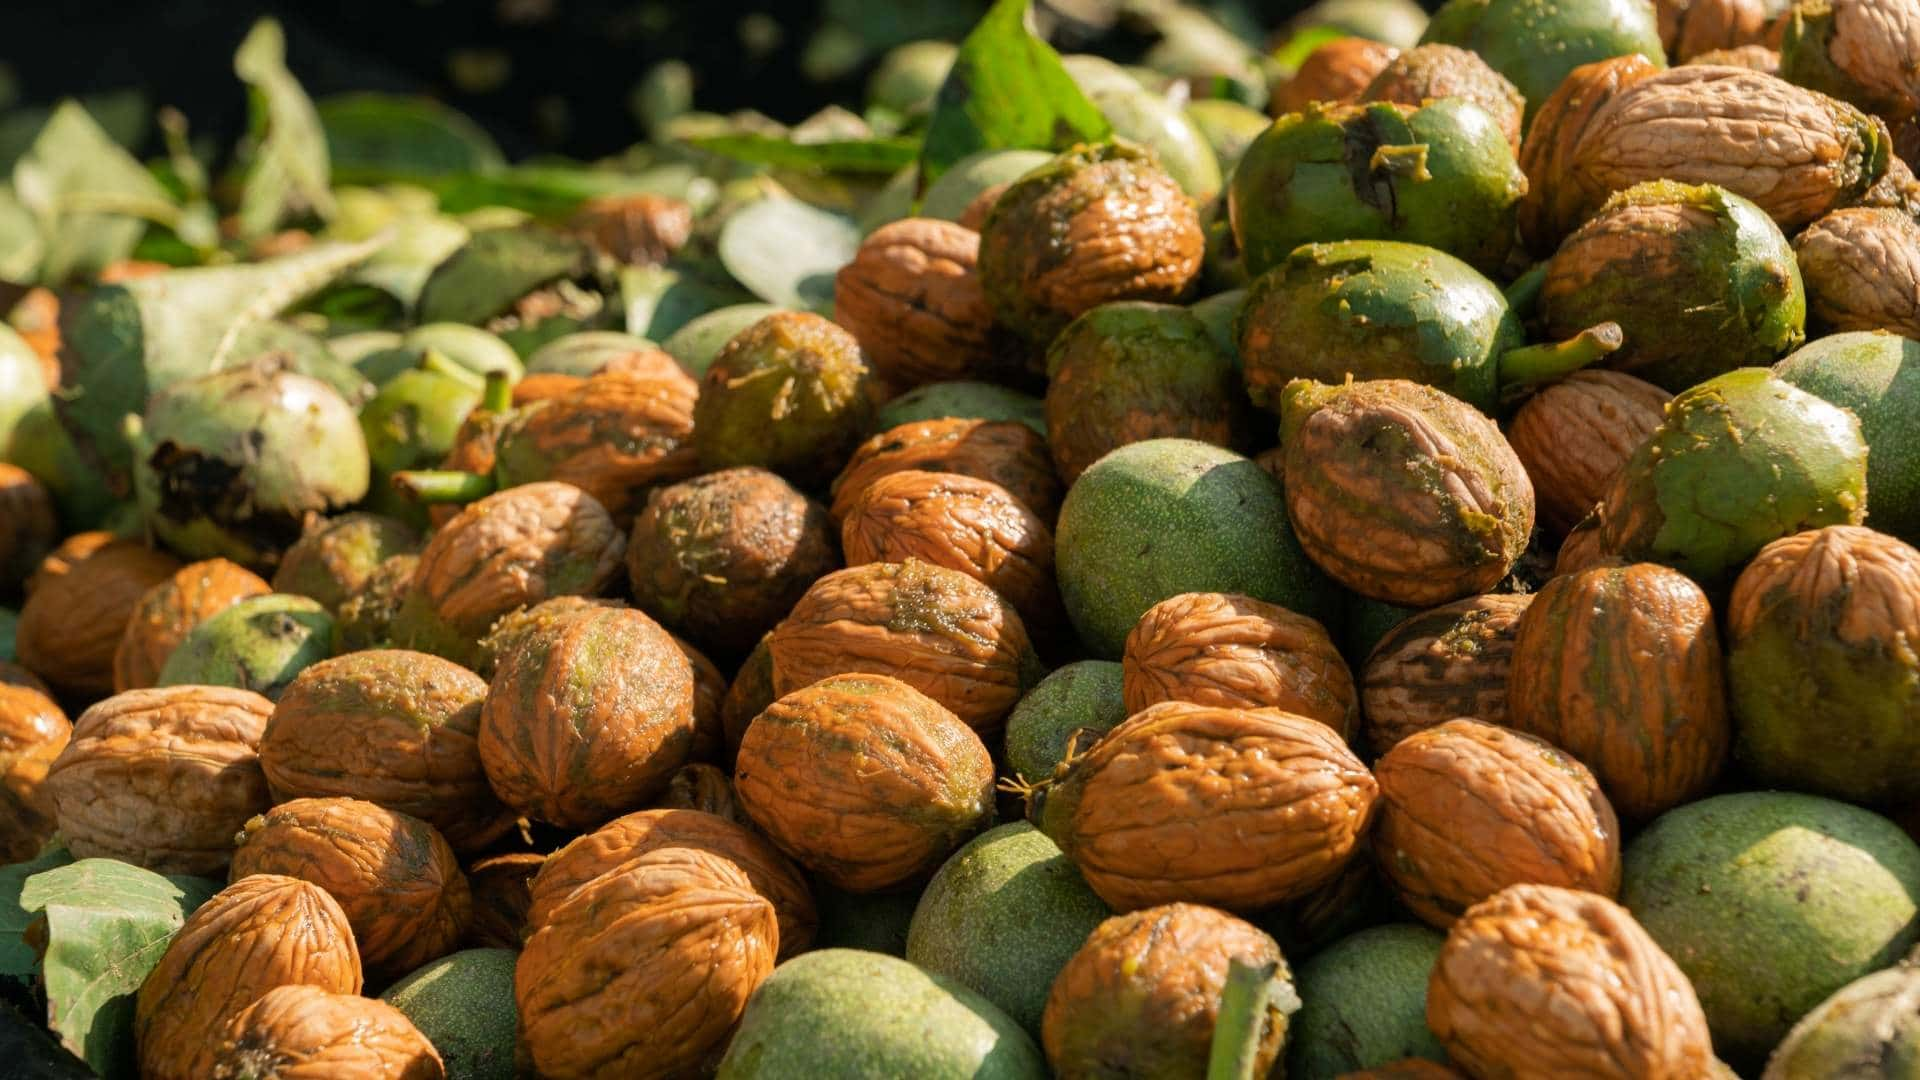 New Great: Walnut Market